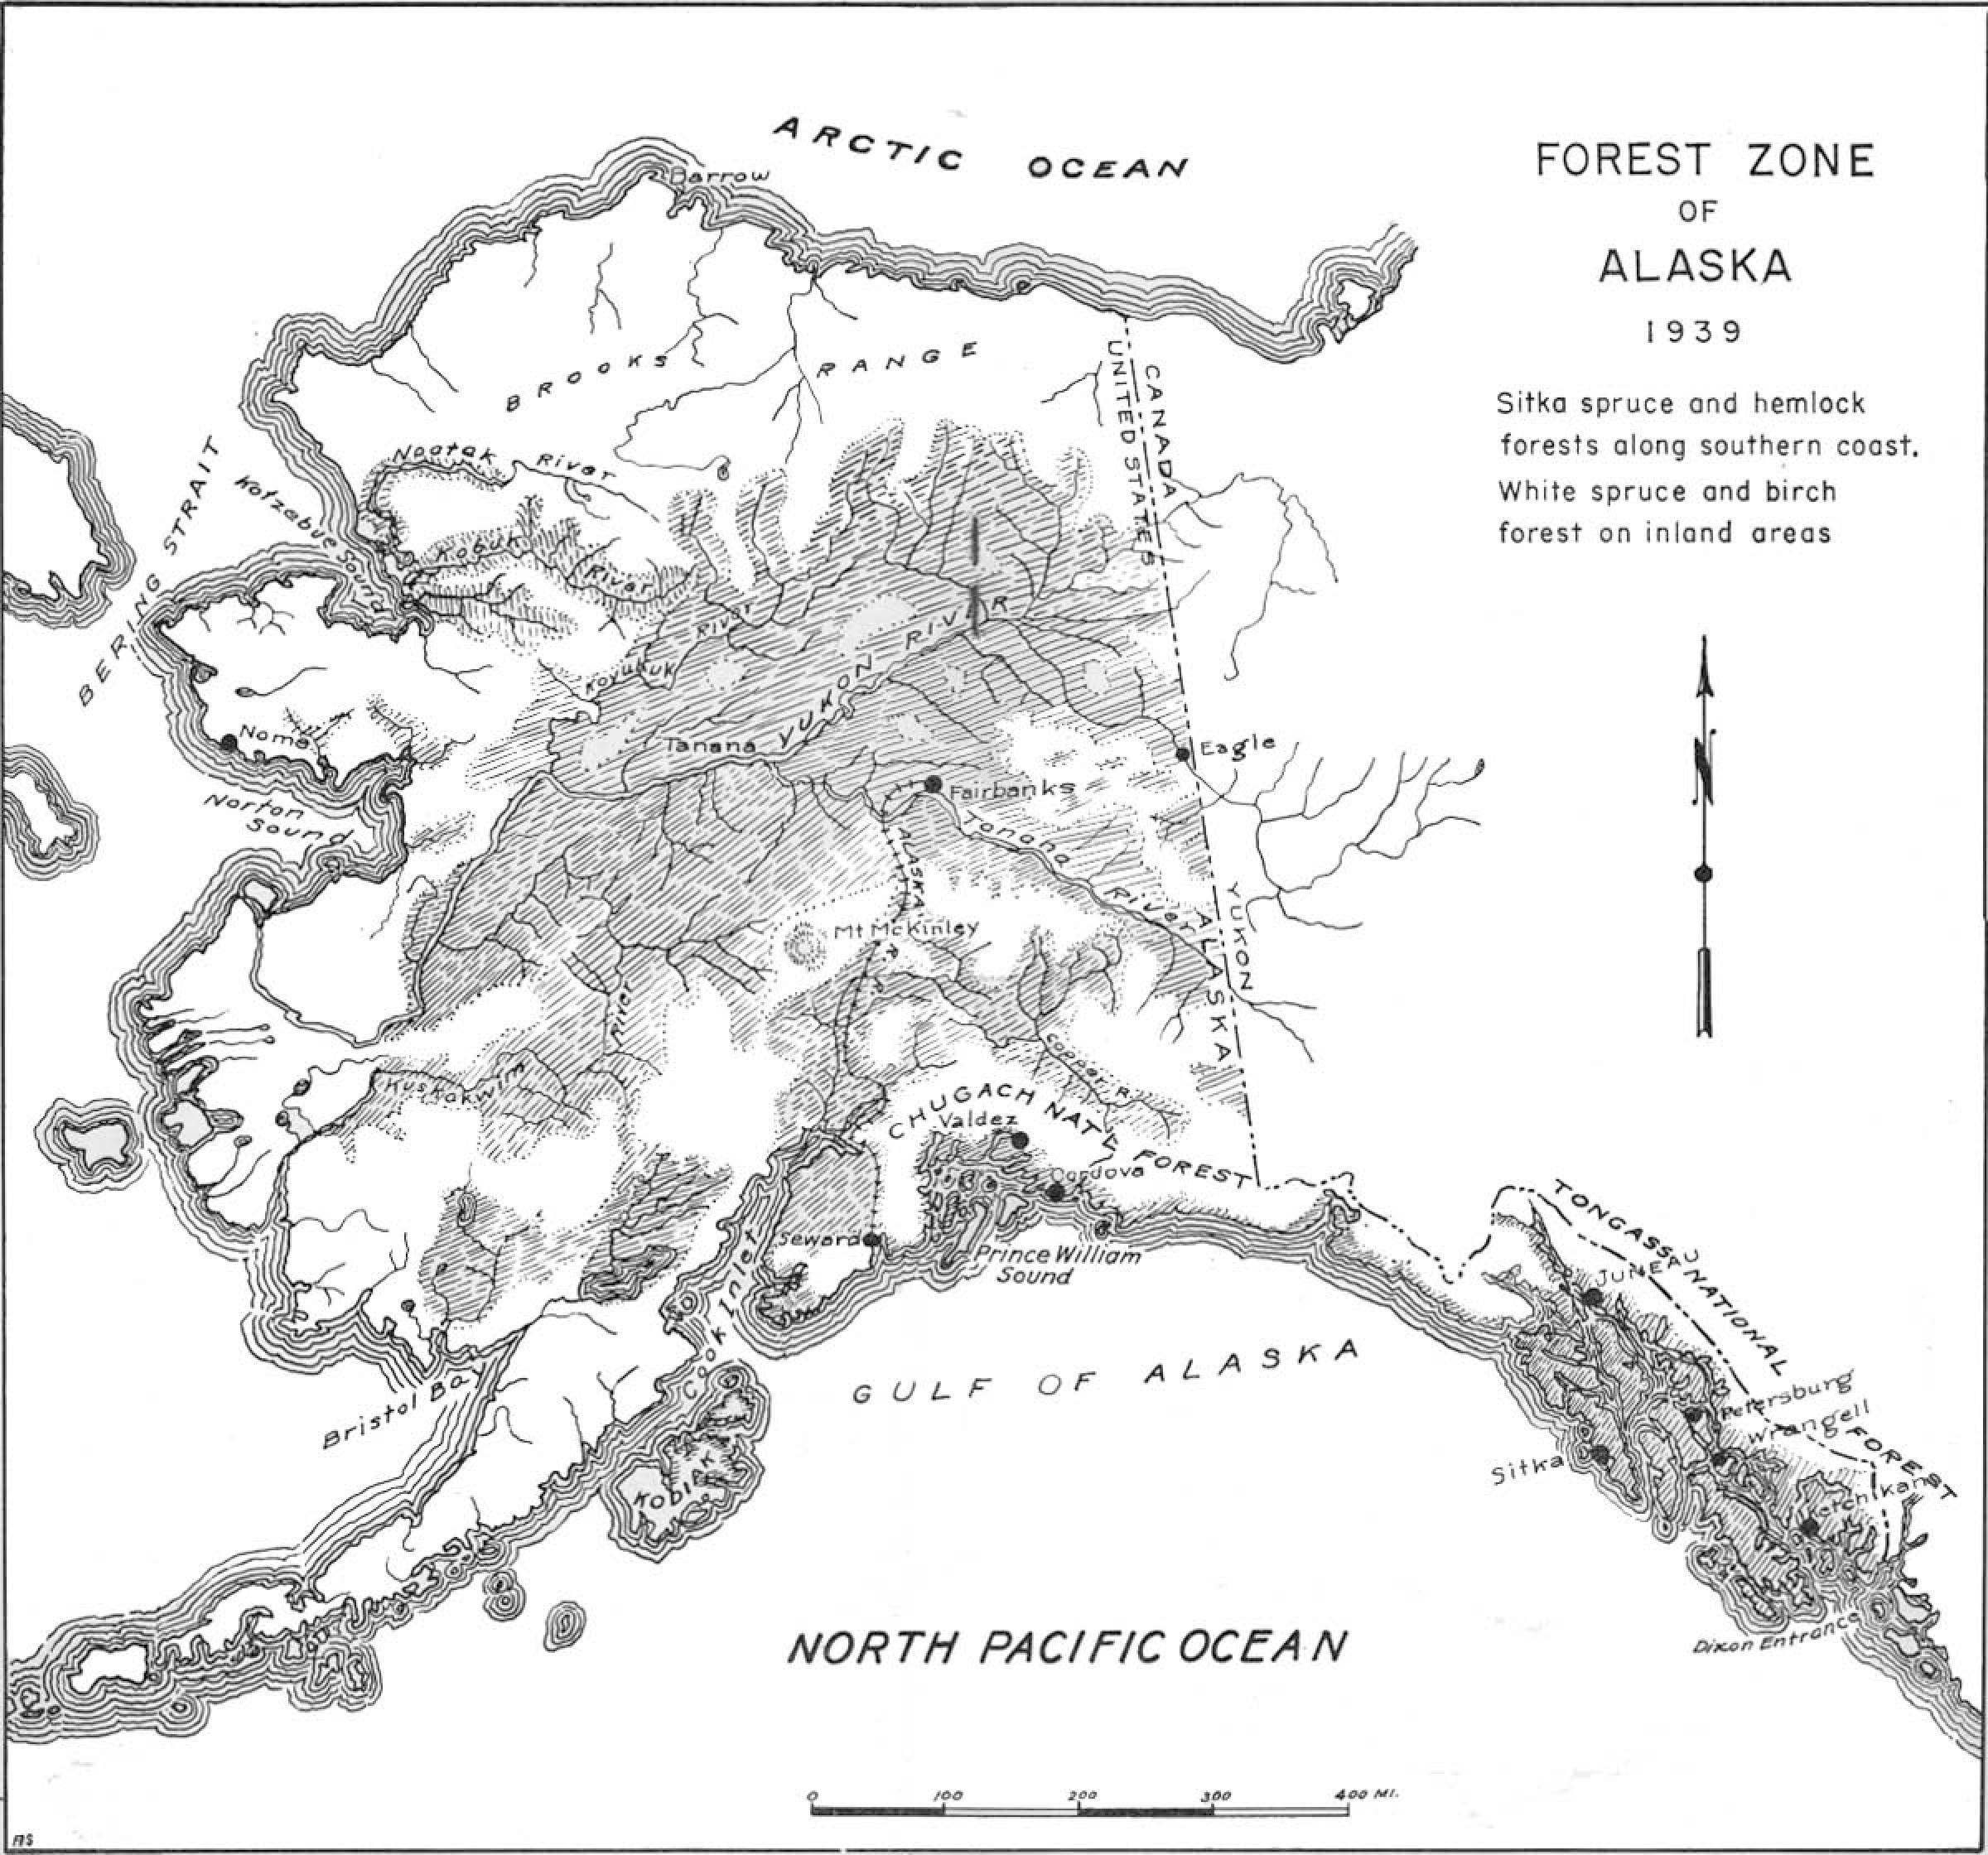 Map of Alaska's forest zone in 1939.  From: http://www.foresthistory.org/aspnet/publications/region/10/alaska_1939/sec1.htm